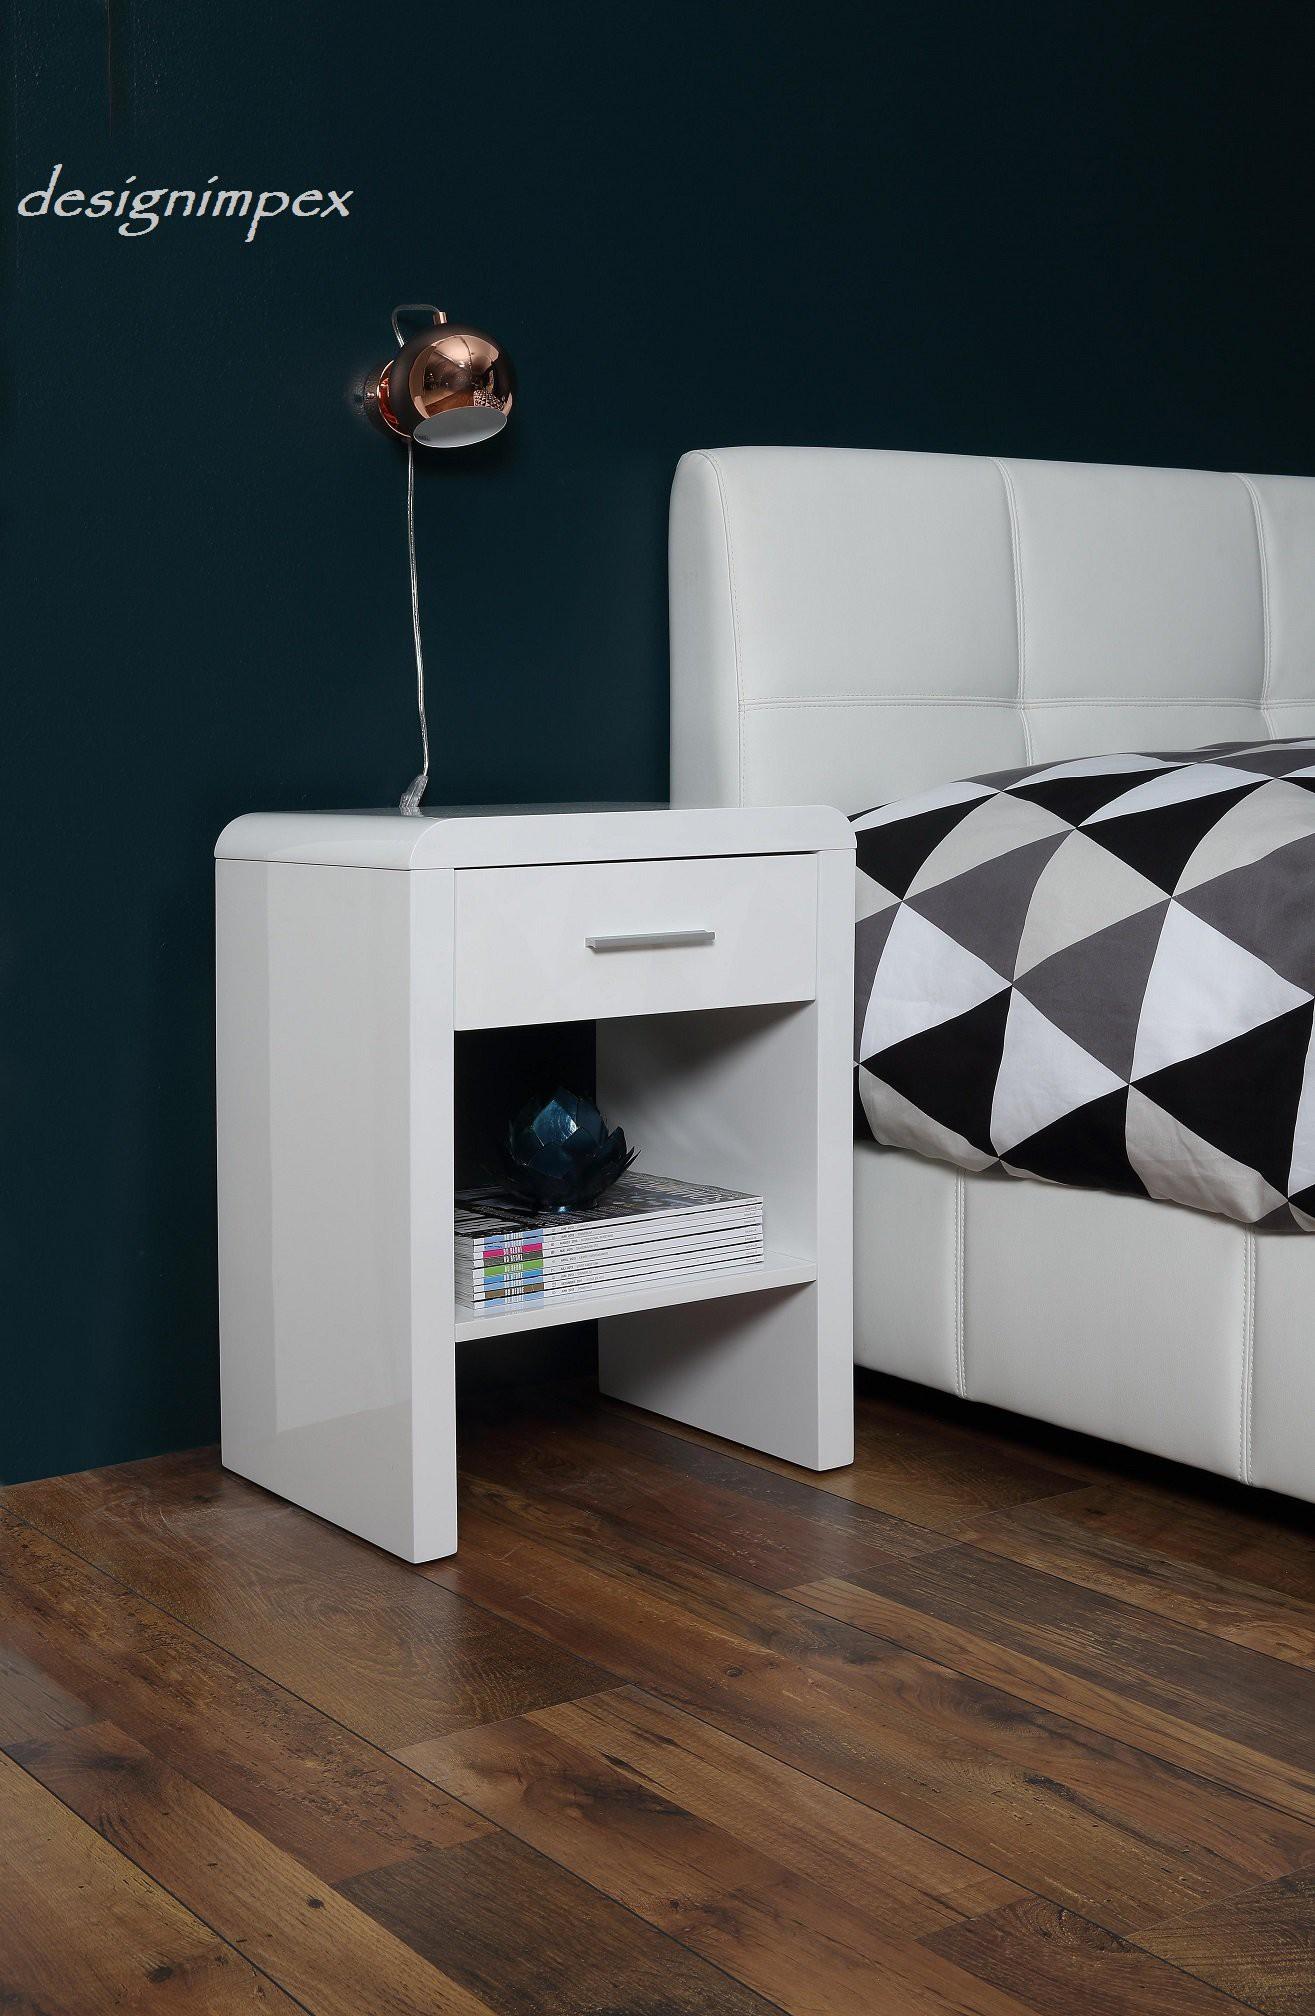 design nachttisch boxspringbett nachtkommode sn 1 wei. Black Bedroom Furniture Sets. Home Design Ideas